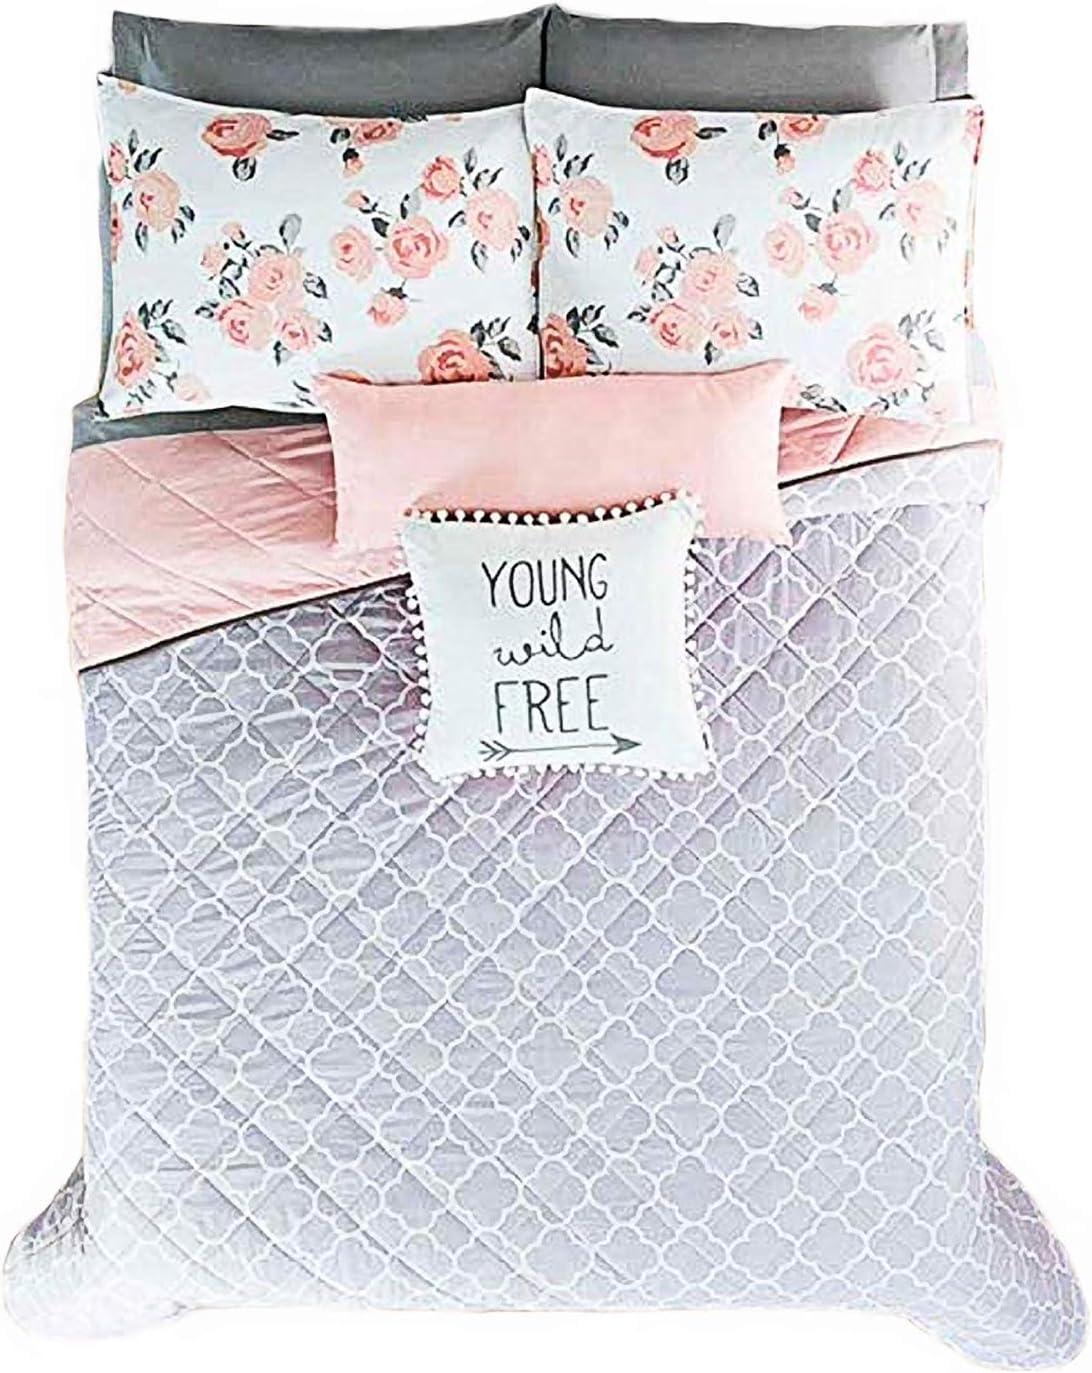 NEW FREE GRAY//PINK TEENS GIRLS Reversible Comforter SET 5 PCS QUEEN//FULL SIZE